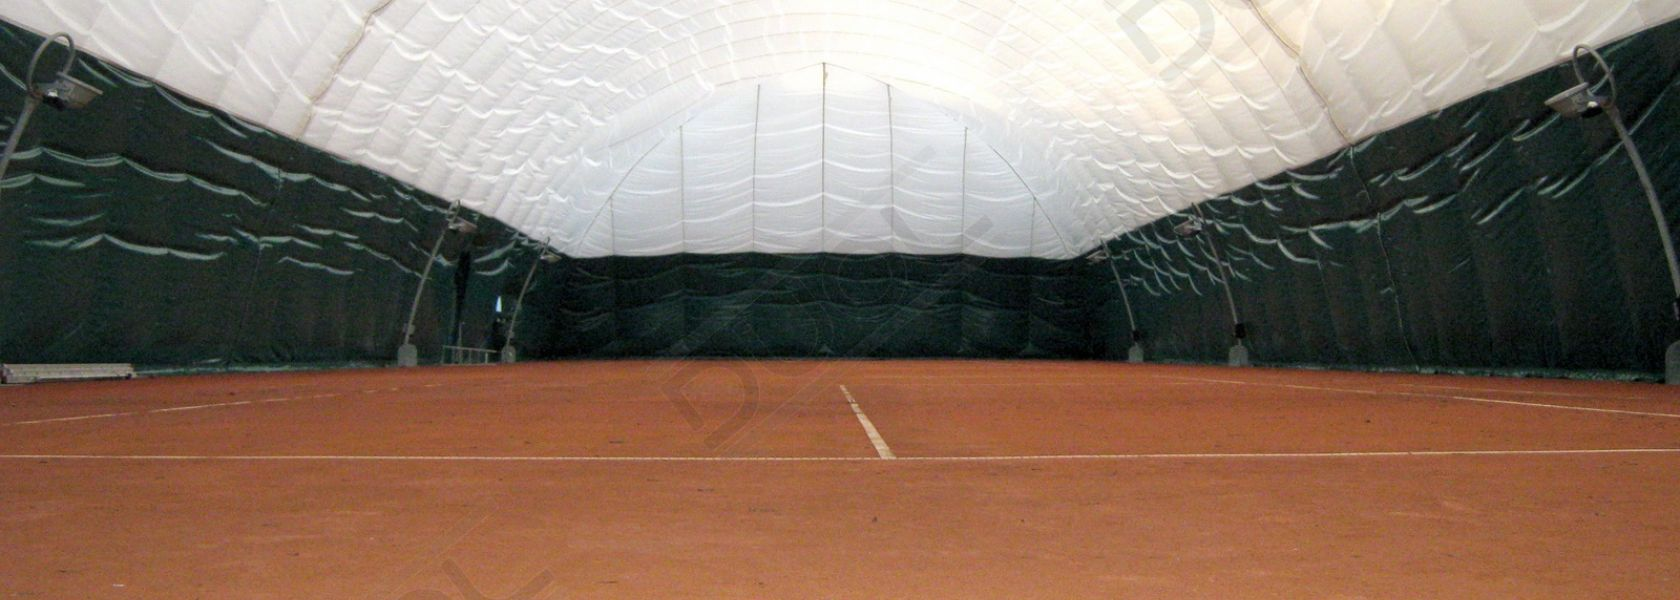 Göteborgs Tennisklubb